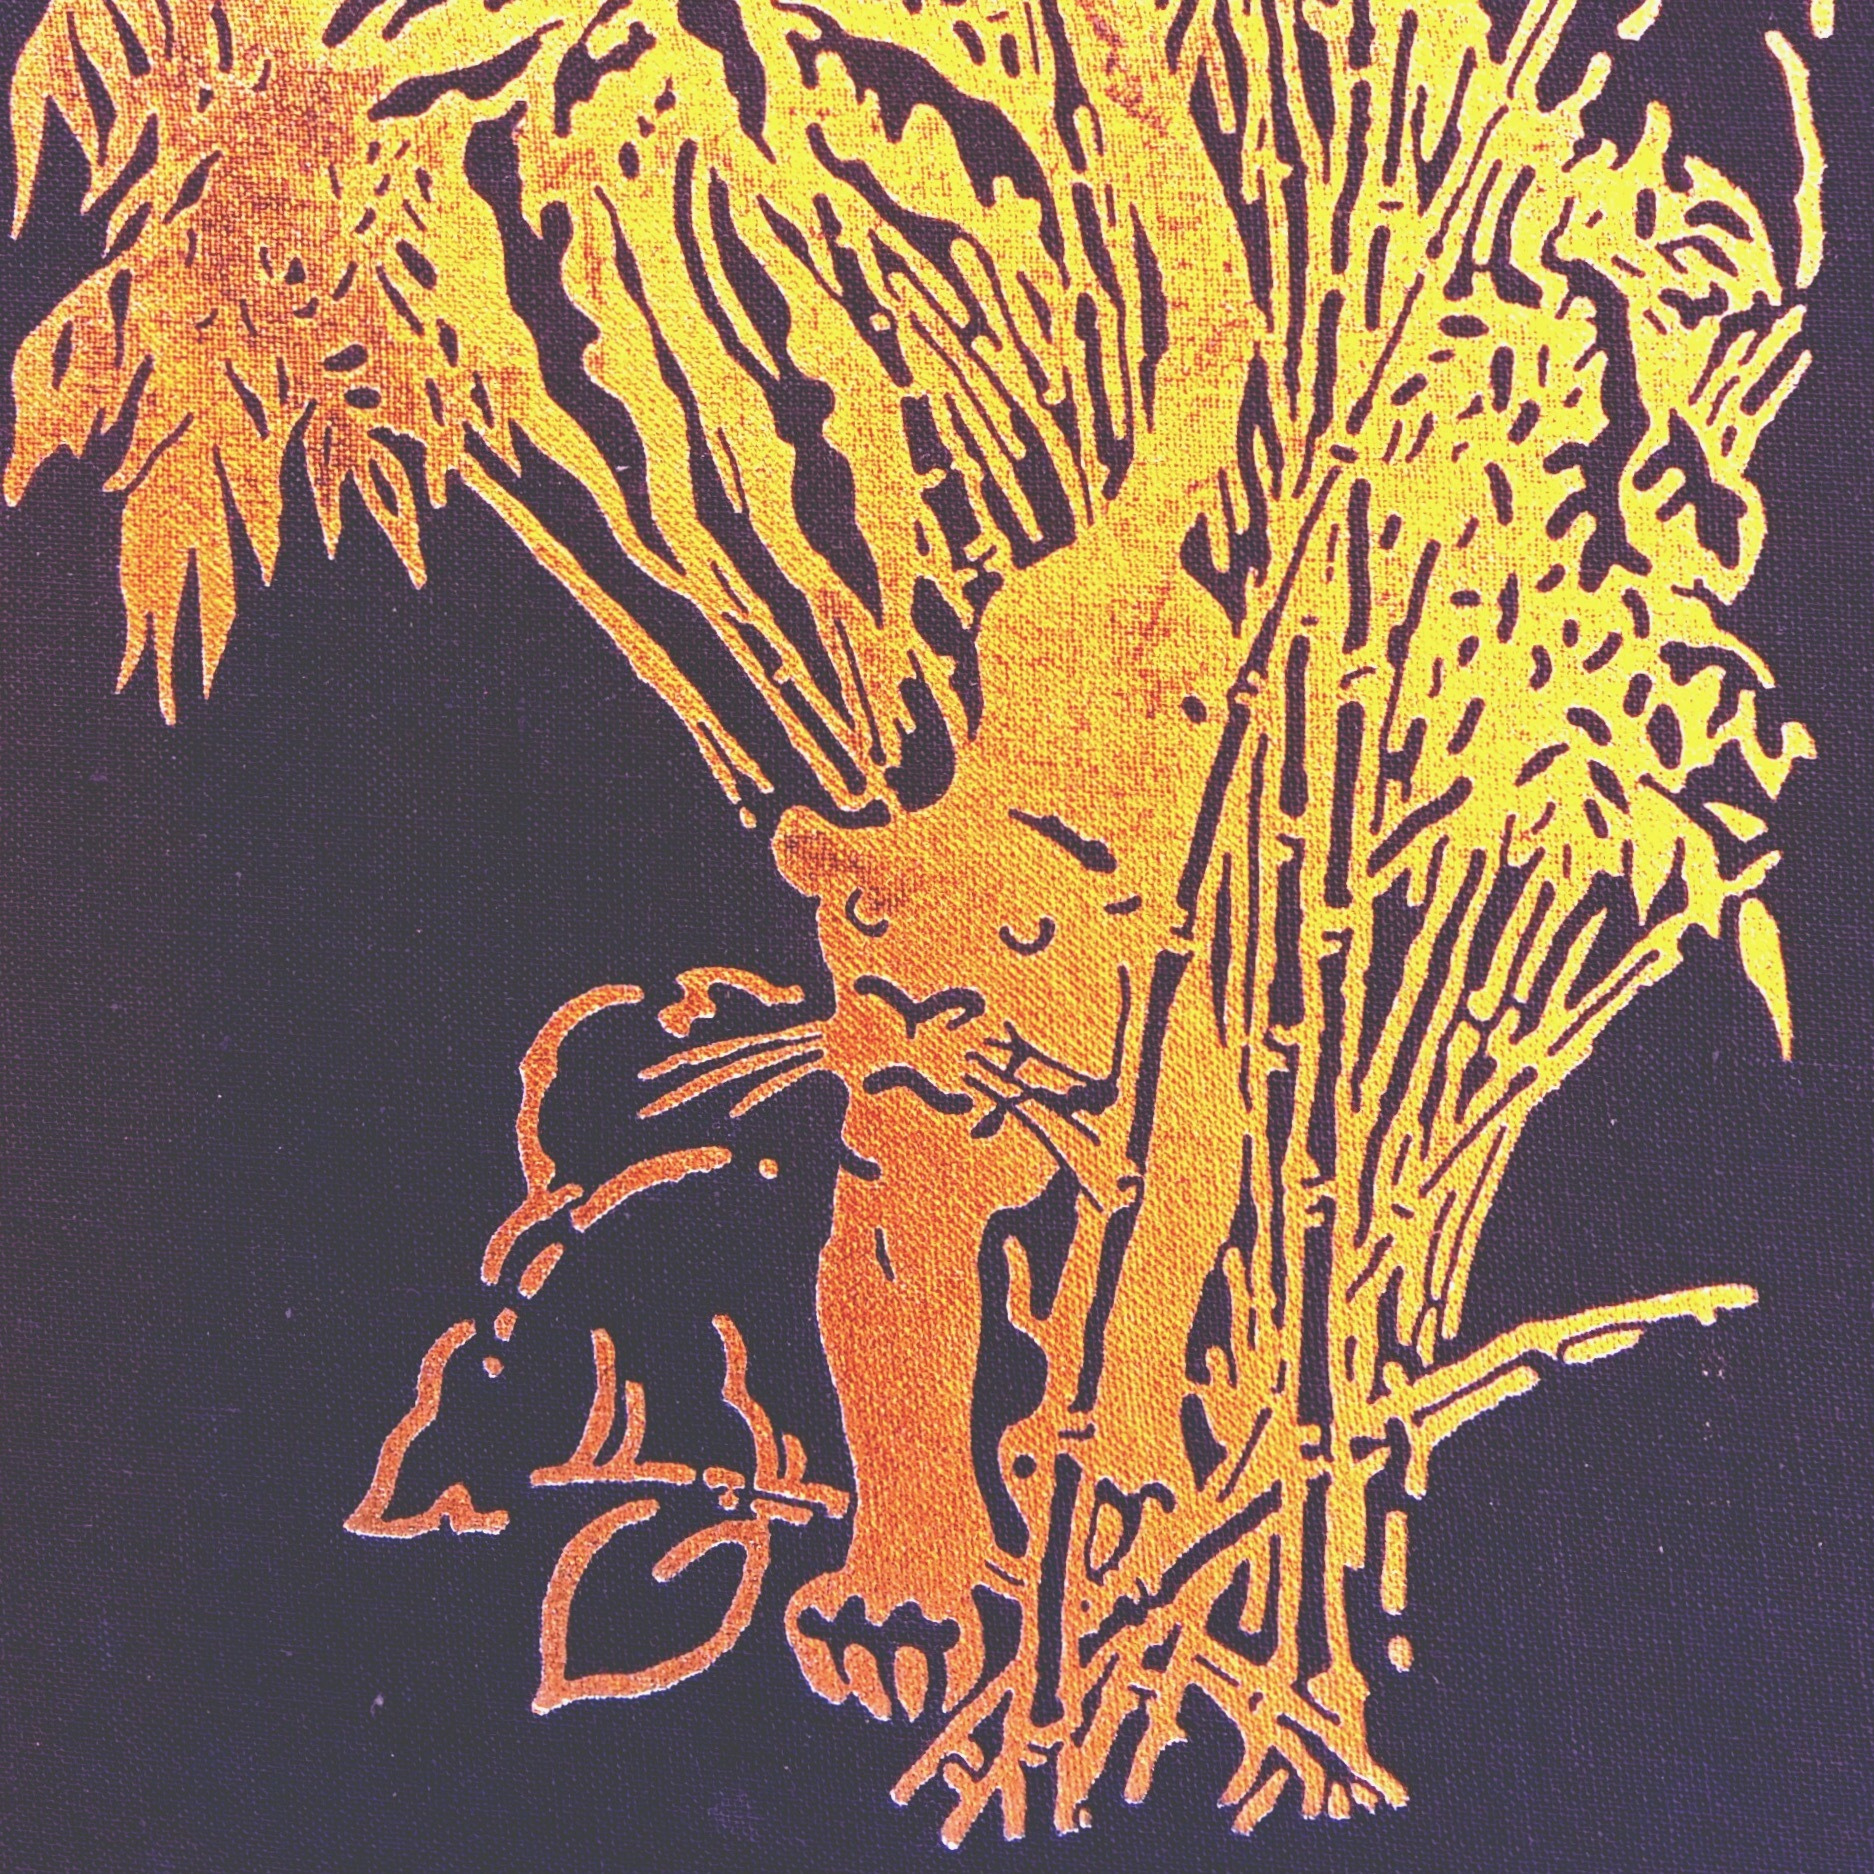 Dschungel Flyer